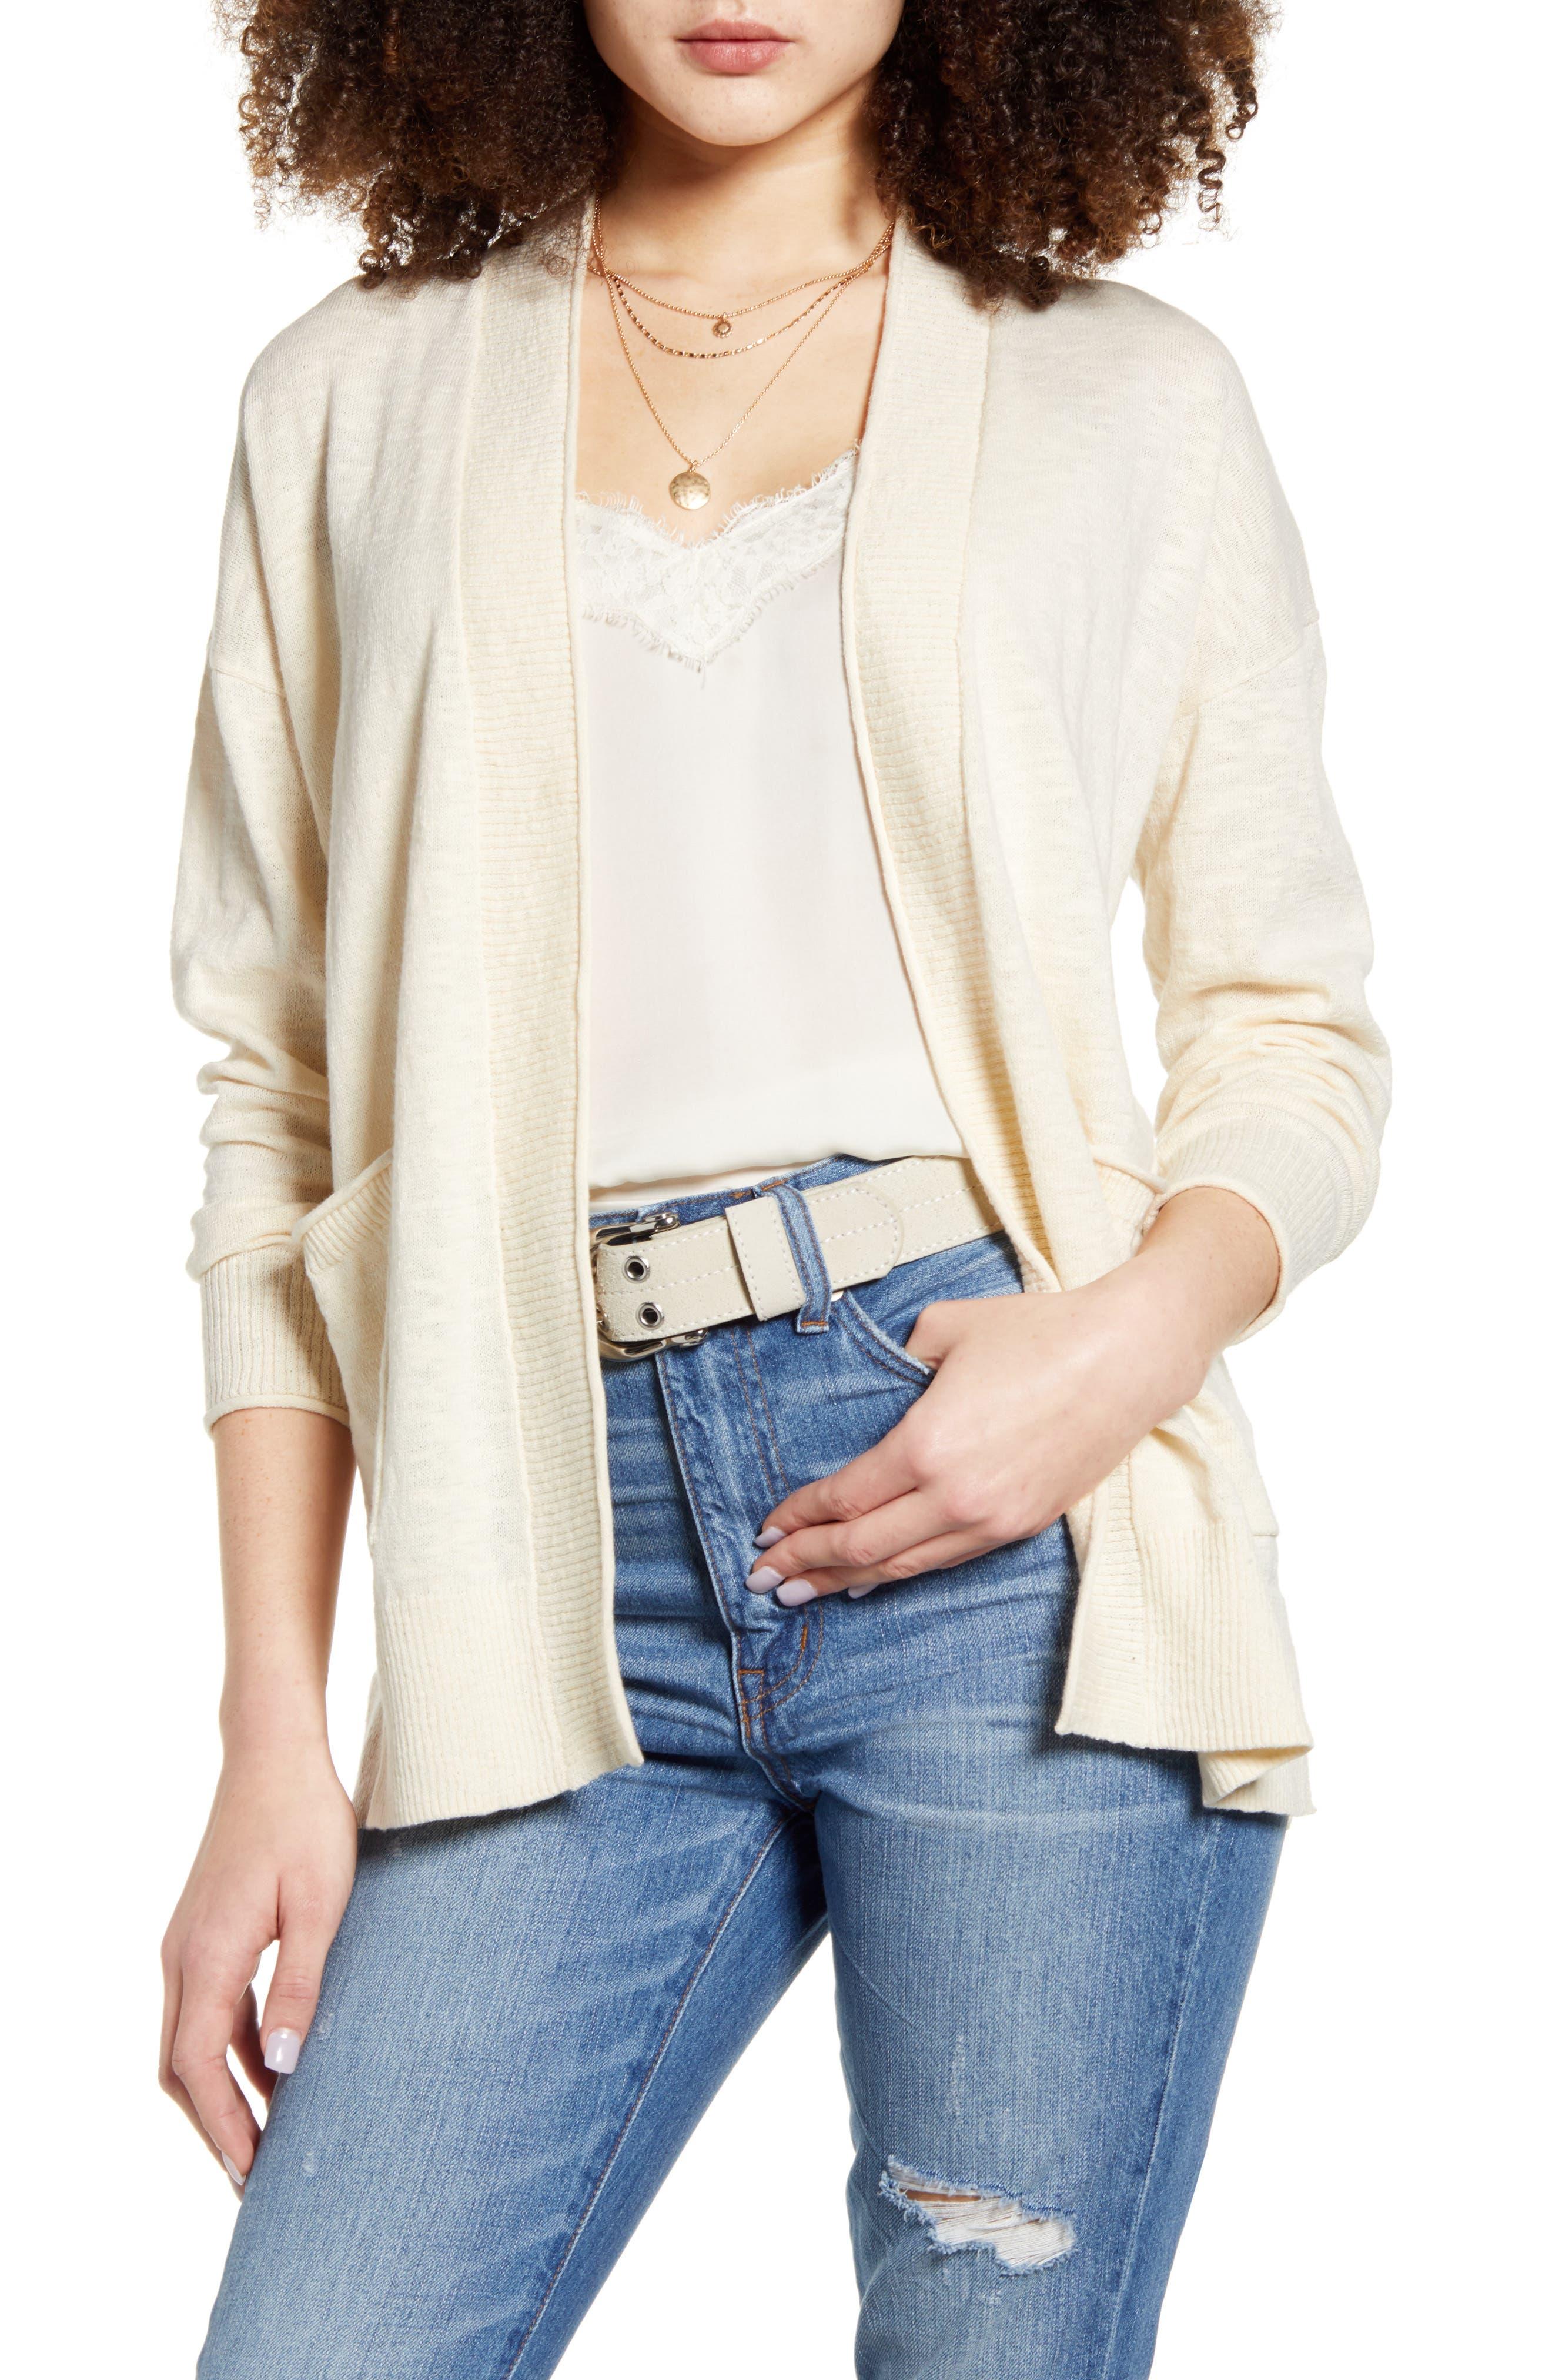 Image of Madewell Bradley Cardigan Sweater